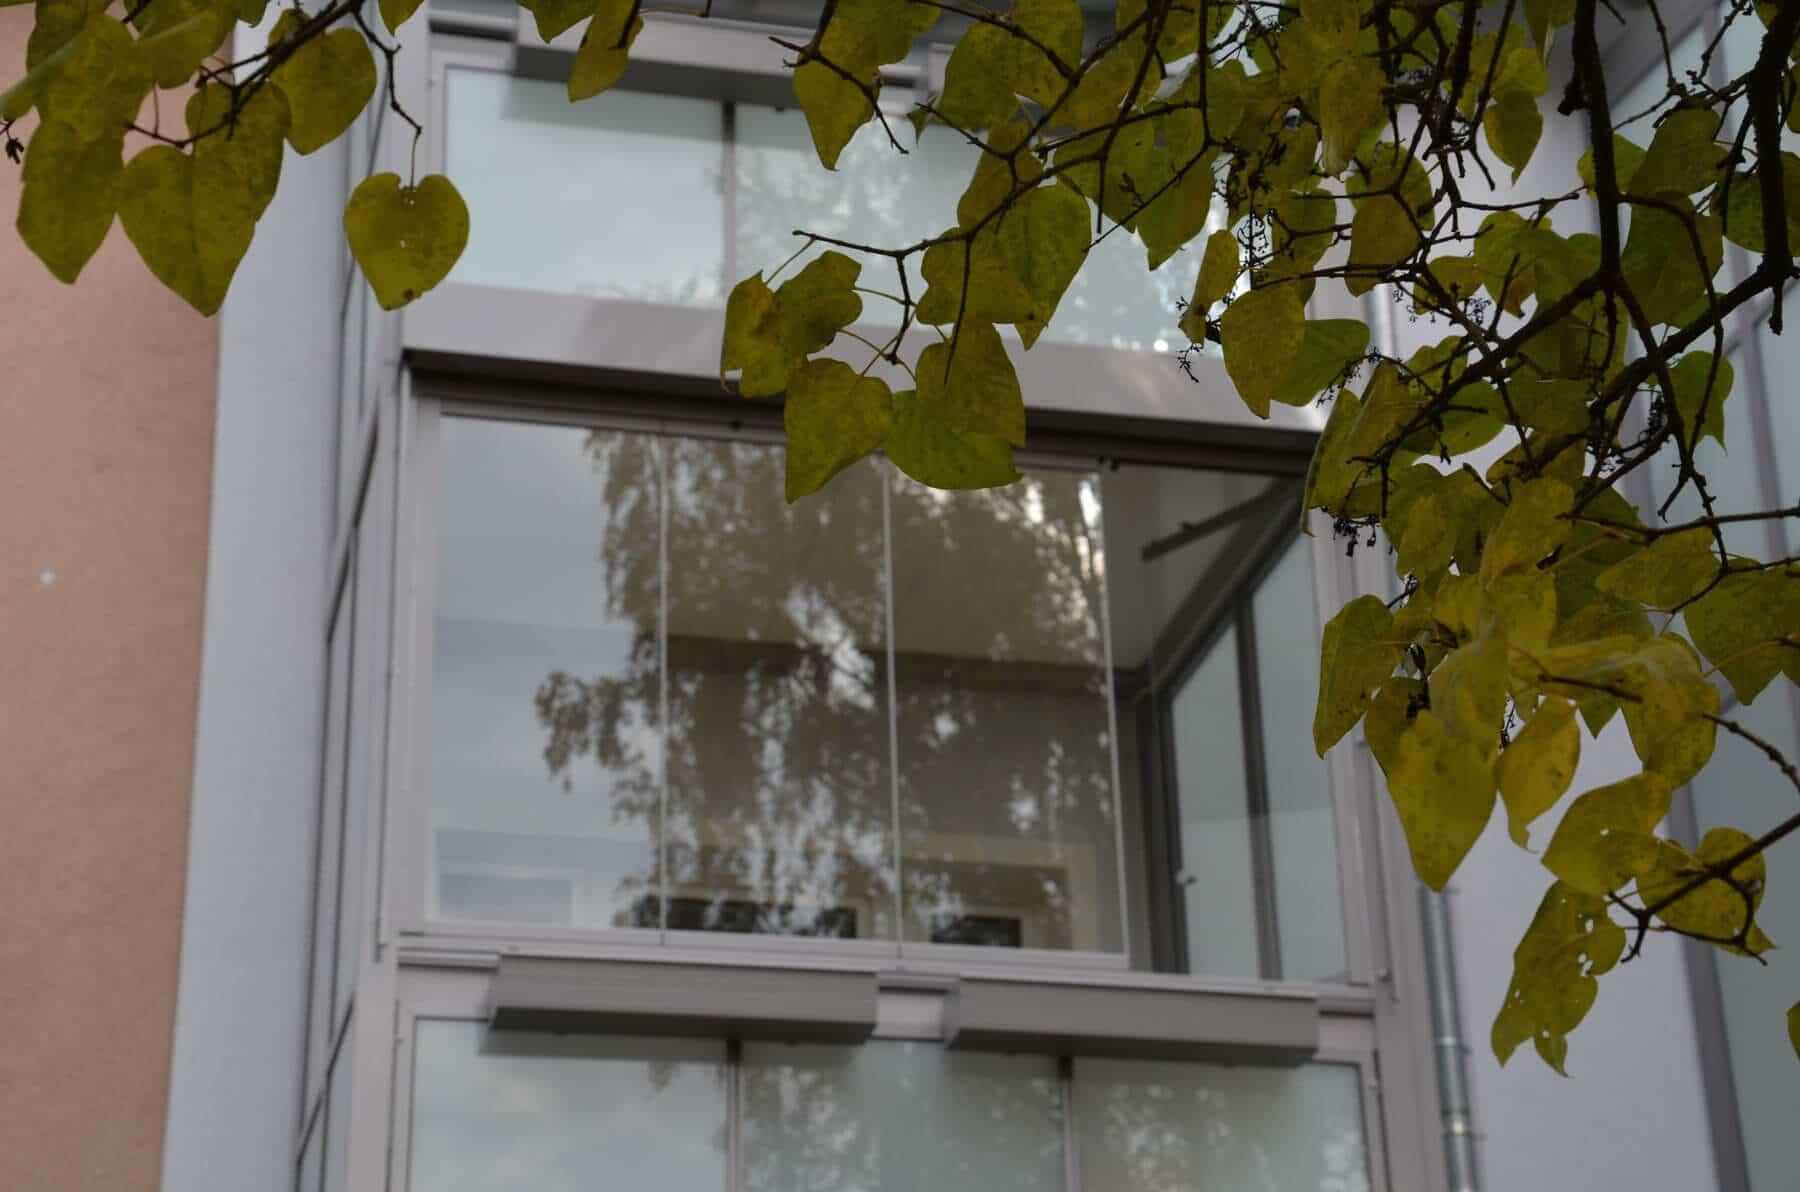 Loggiaverglasung in Grau in Linz montiert